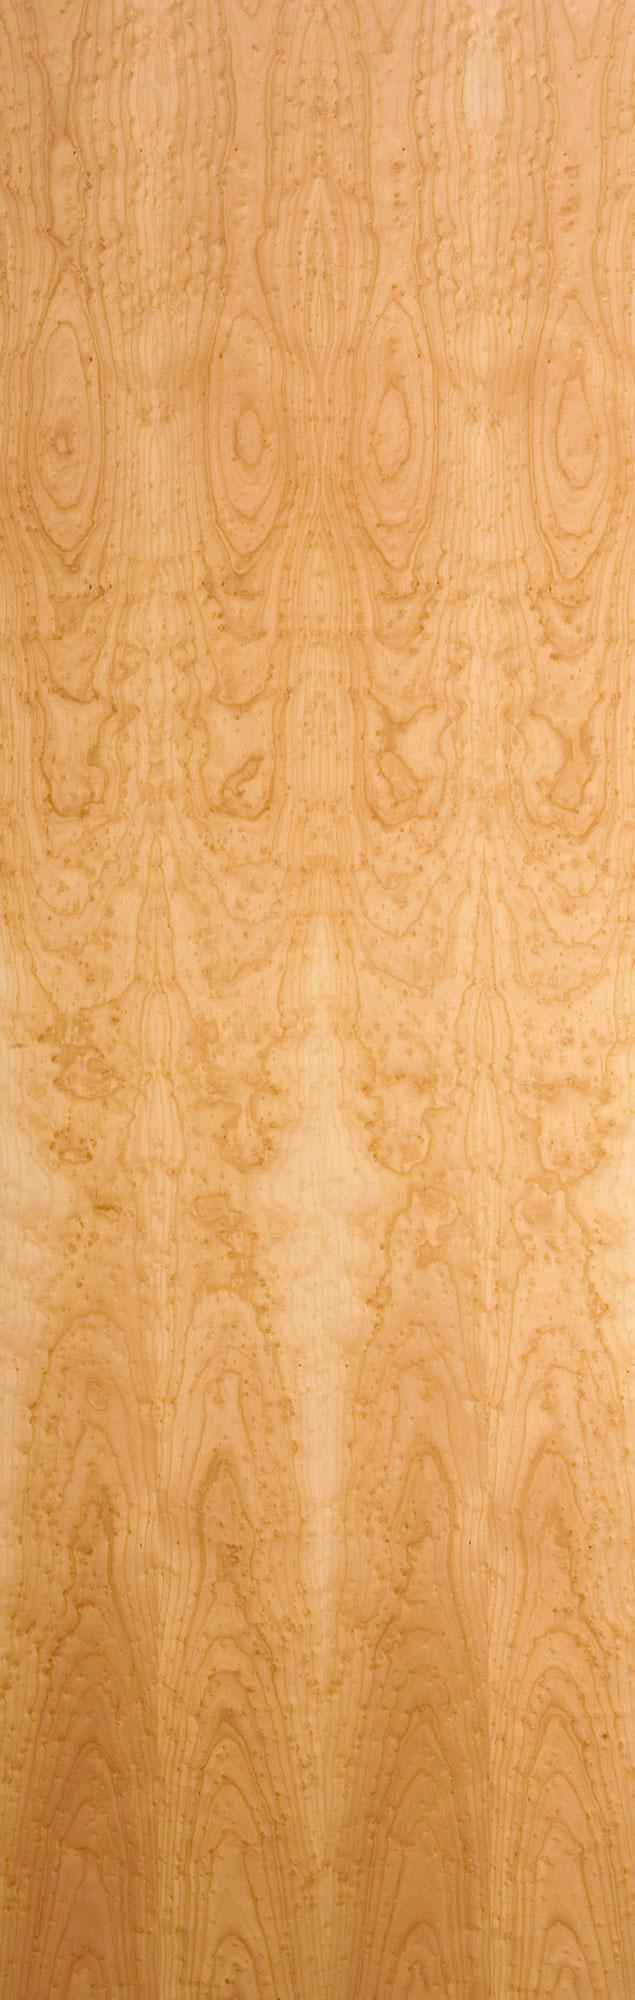 cherry drops schorn groh furniere veneers. Black Bedroom Furniture Sets. Home Design Ideas